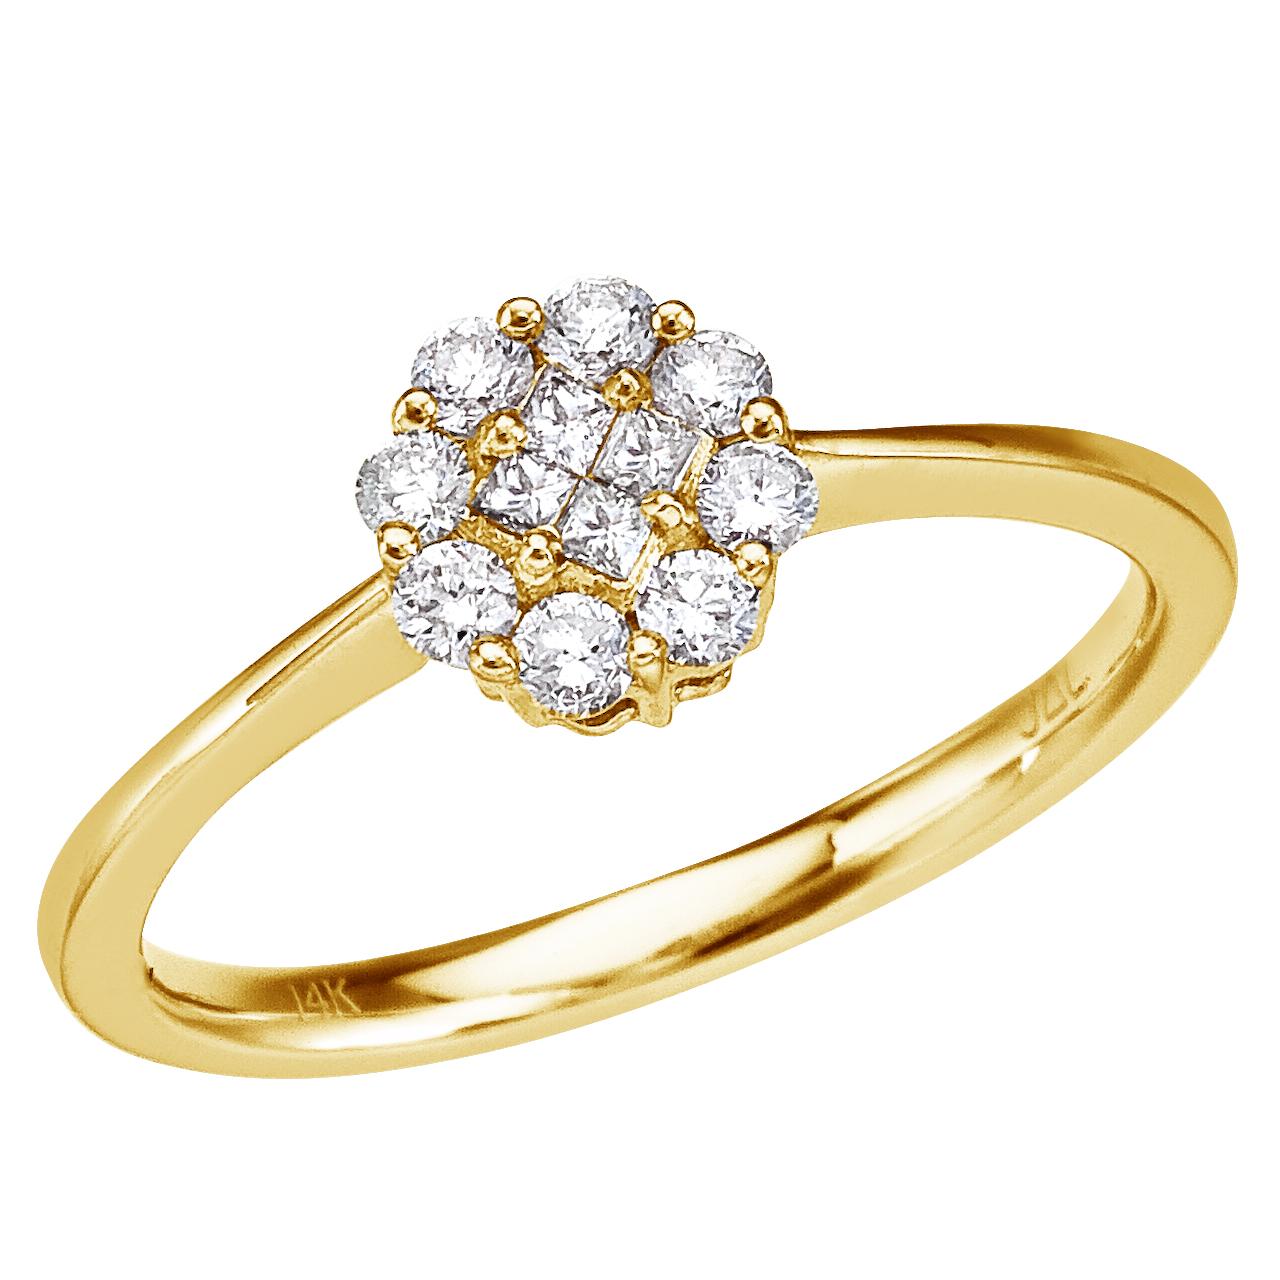 14k Yellow Gold .34 Ct Diamond Cluster Ring